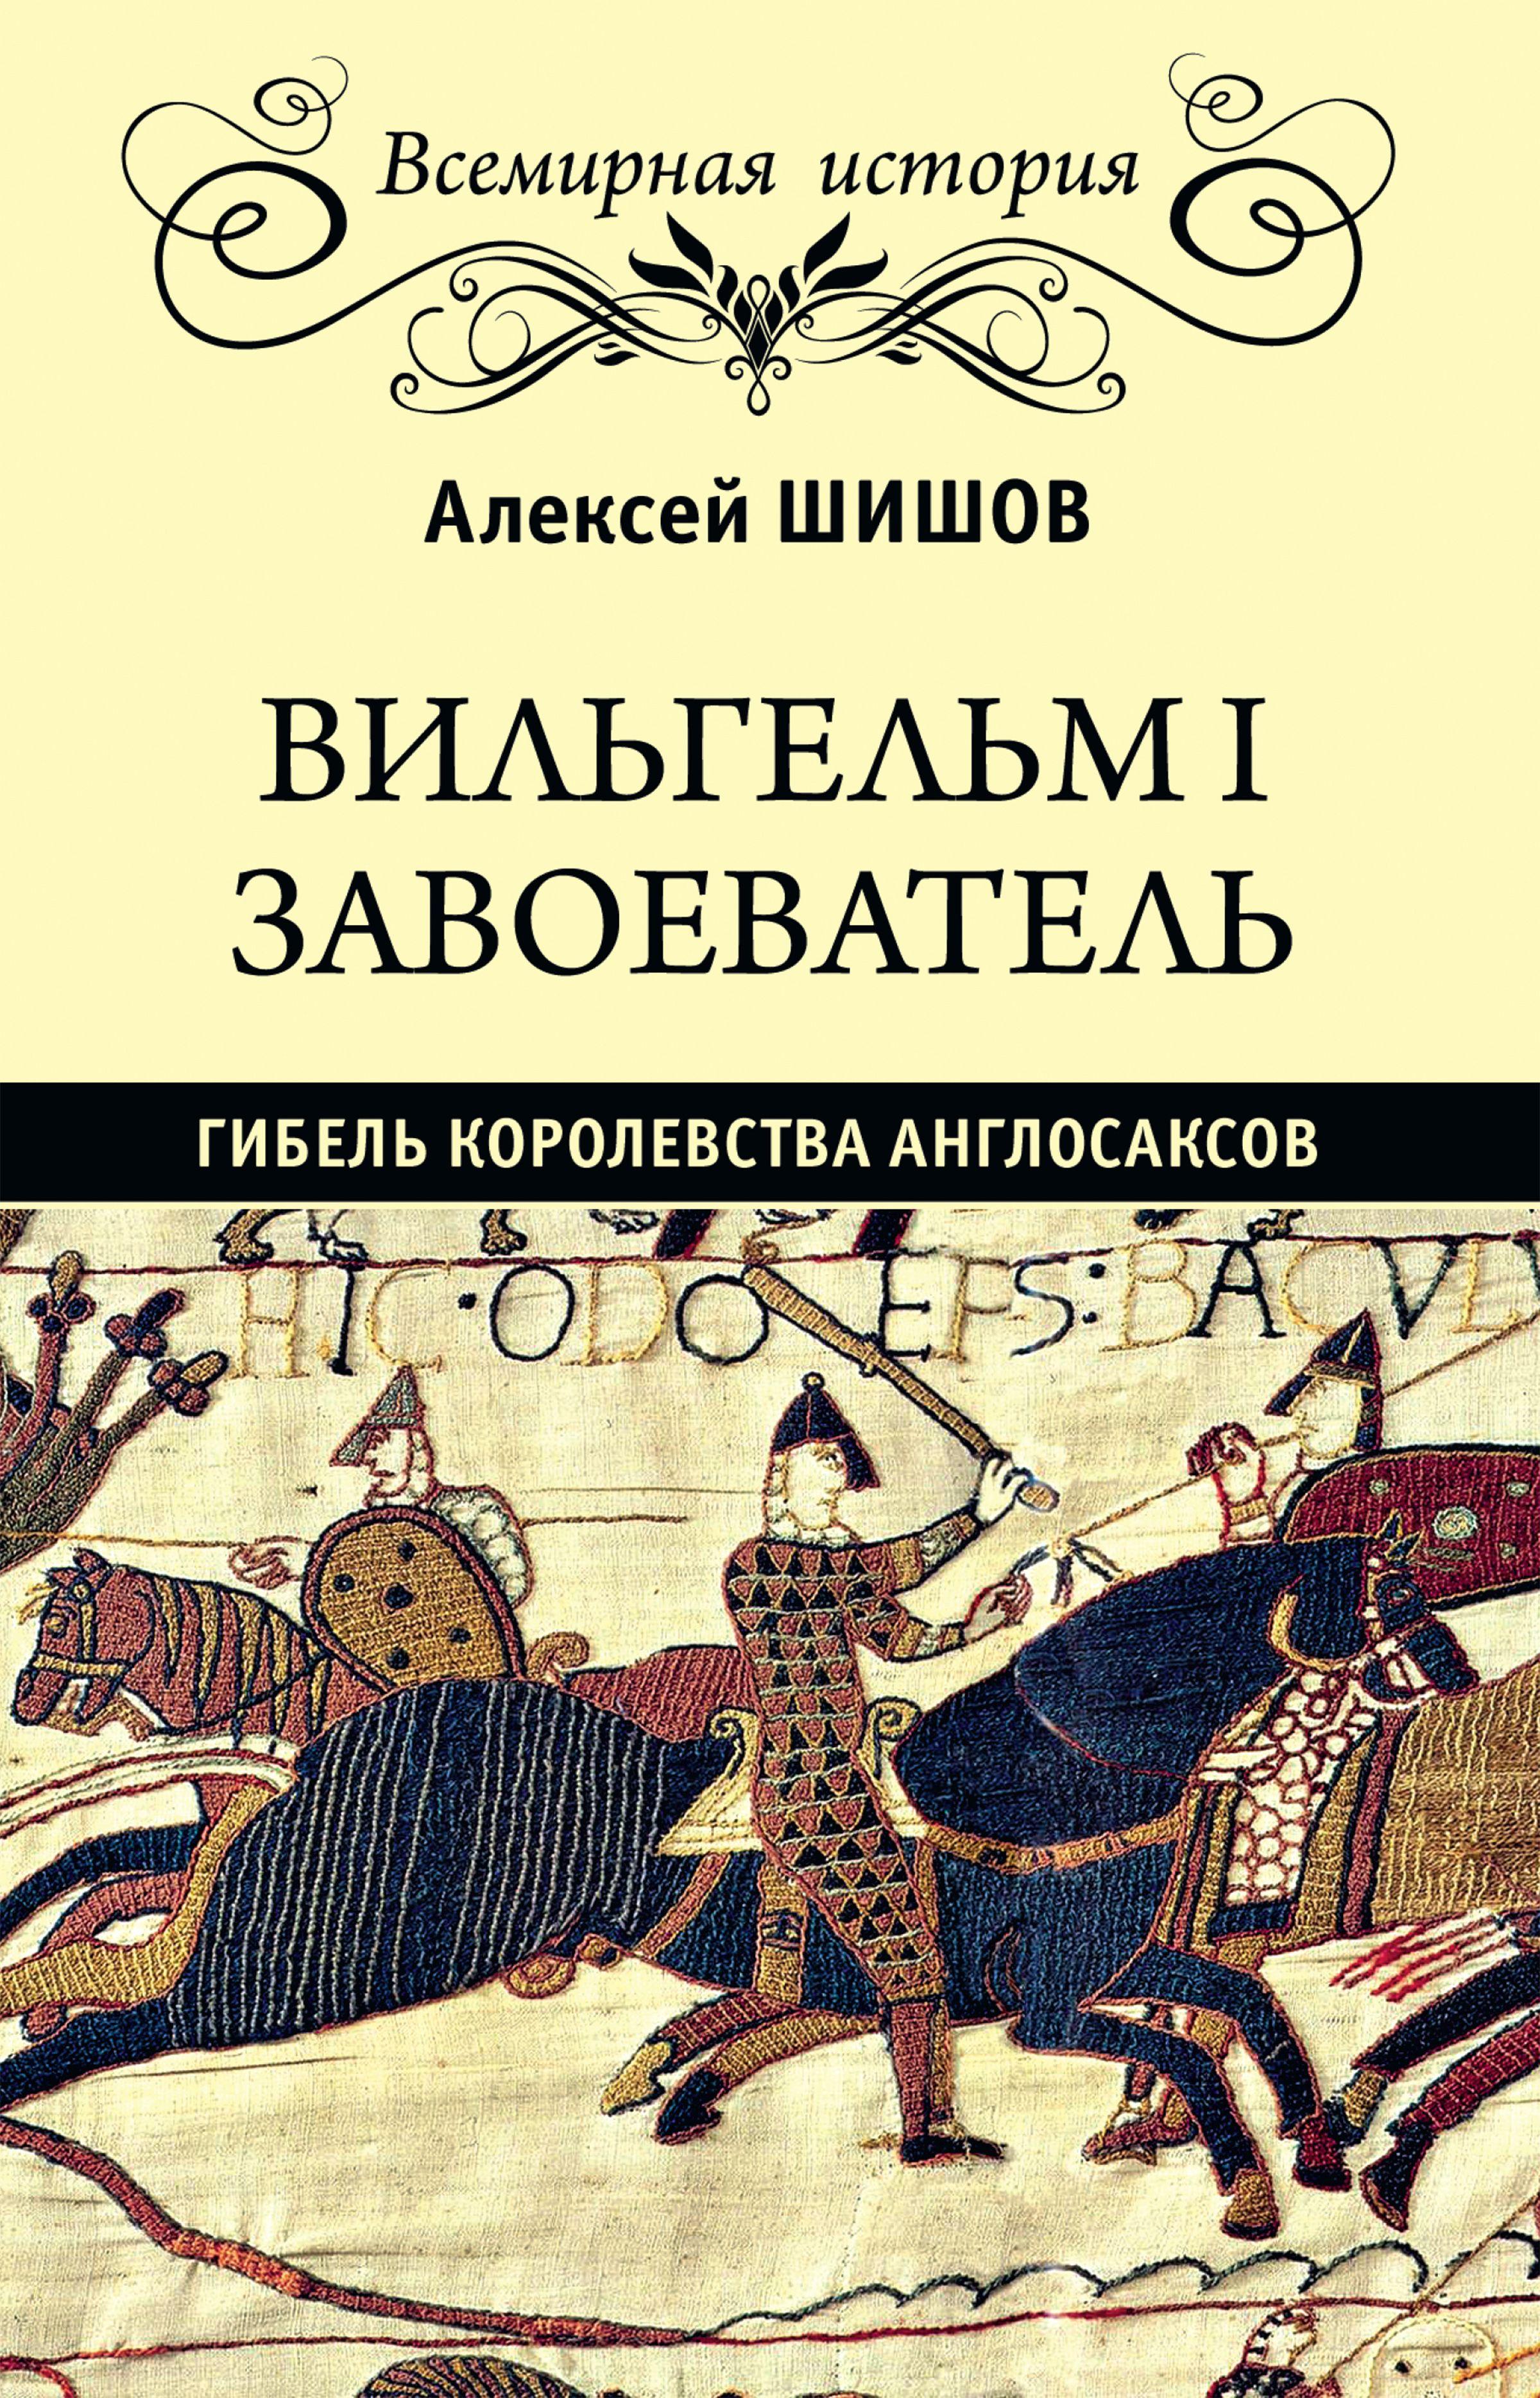 vilgelm i zavoevatel gibel korolevstva anglo saksov